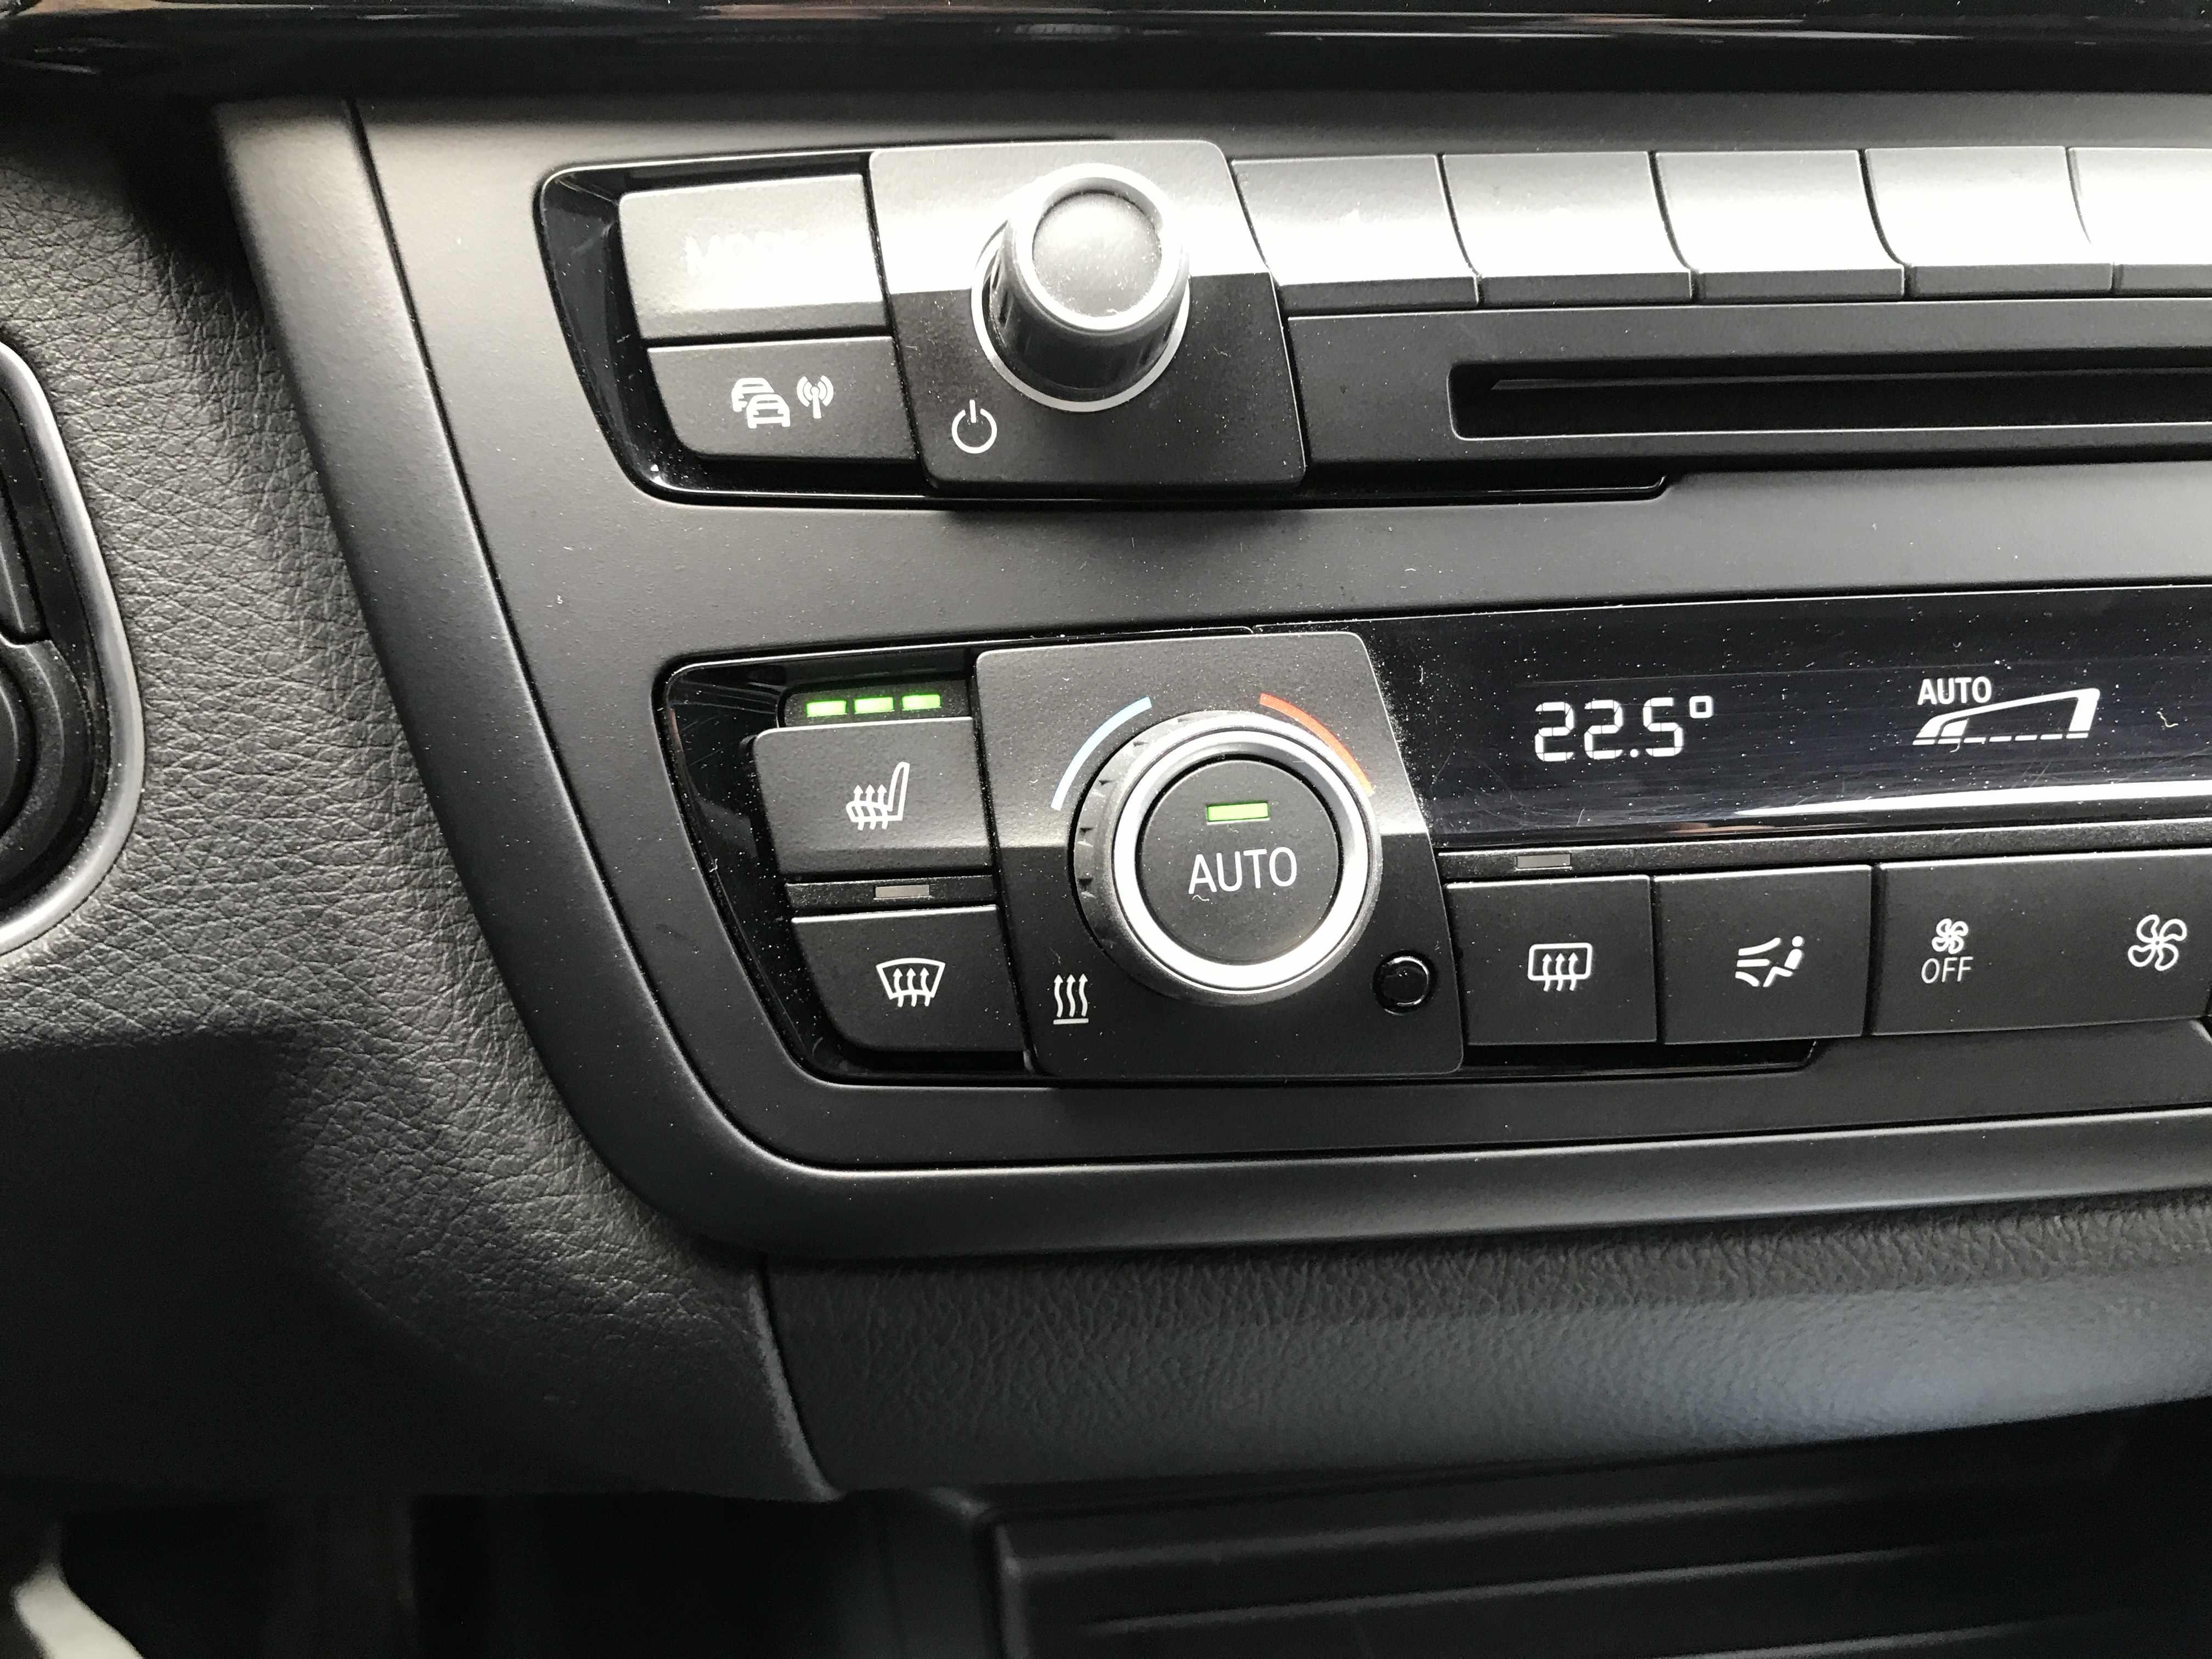 Bmw 418 gr coupé automaat!!